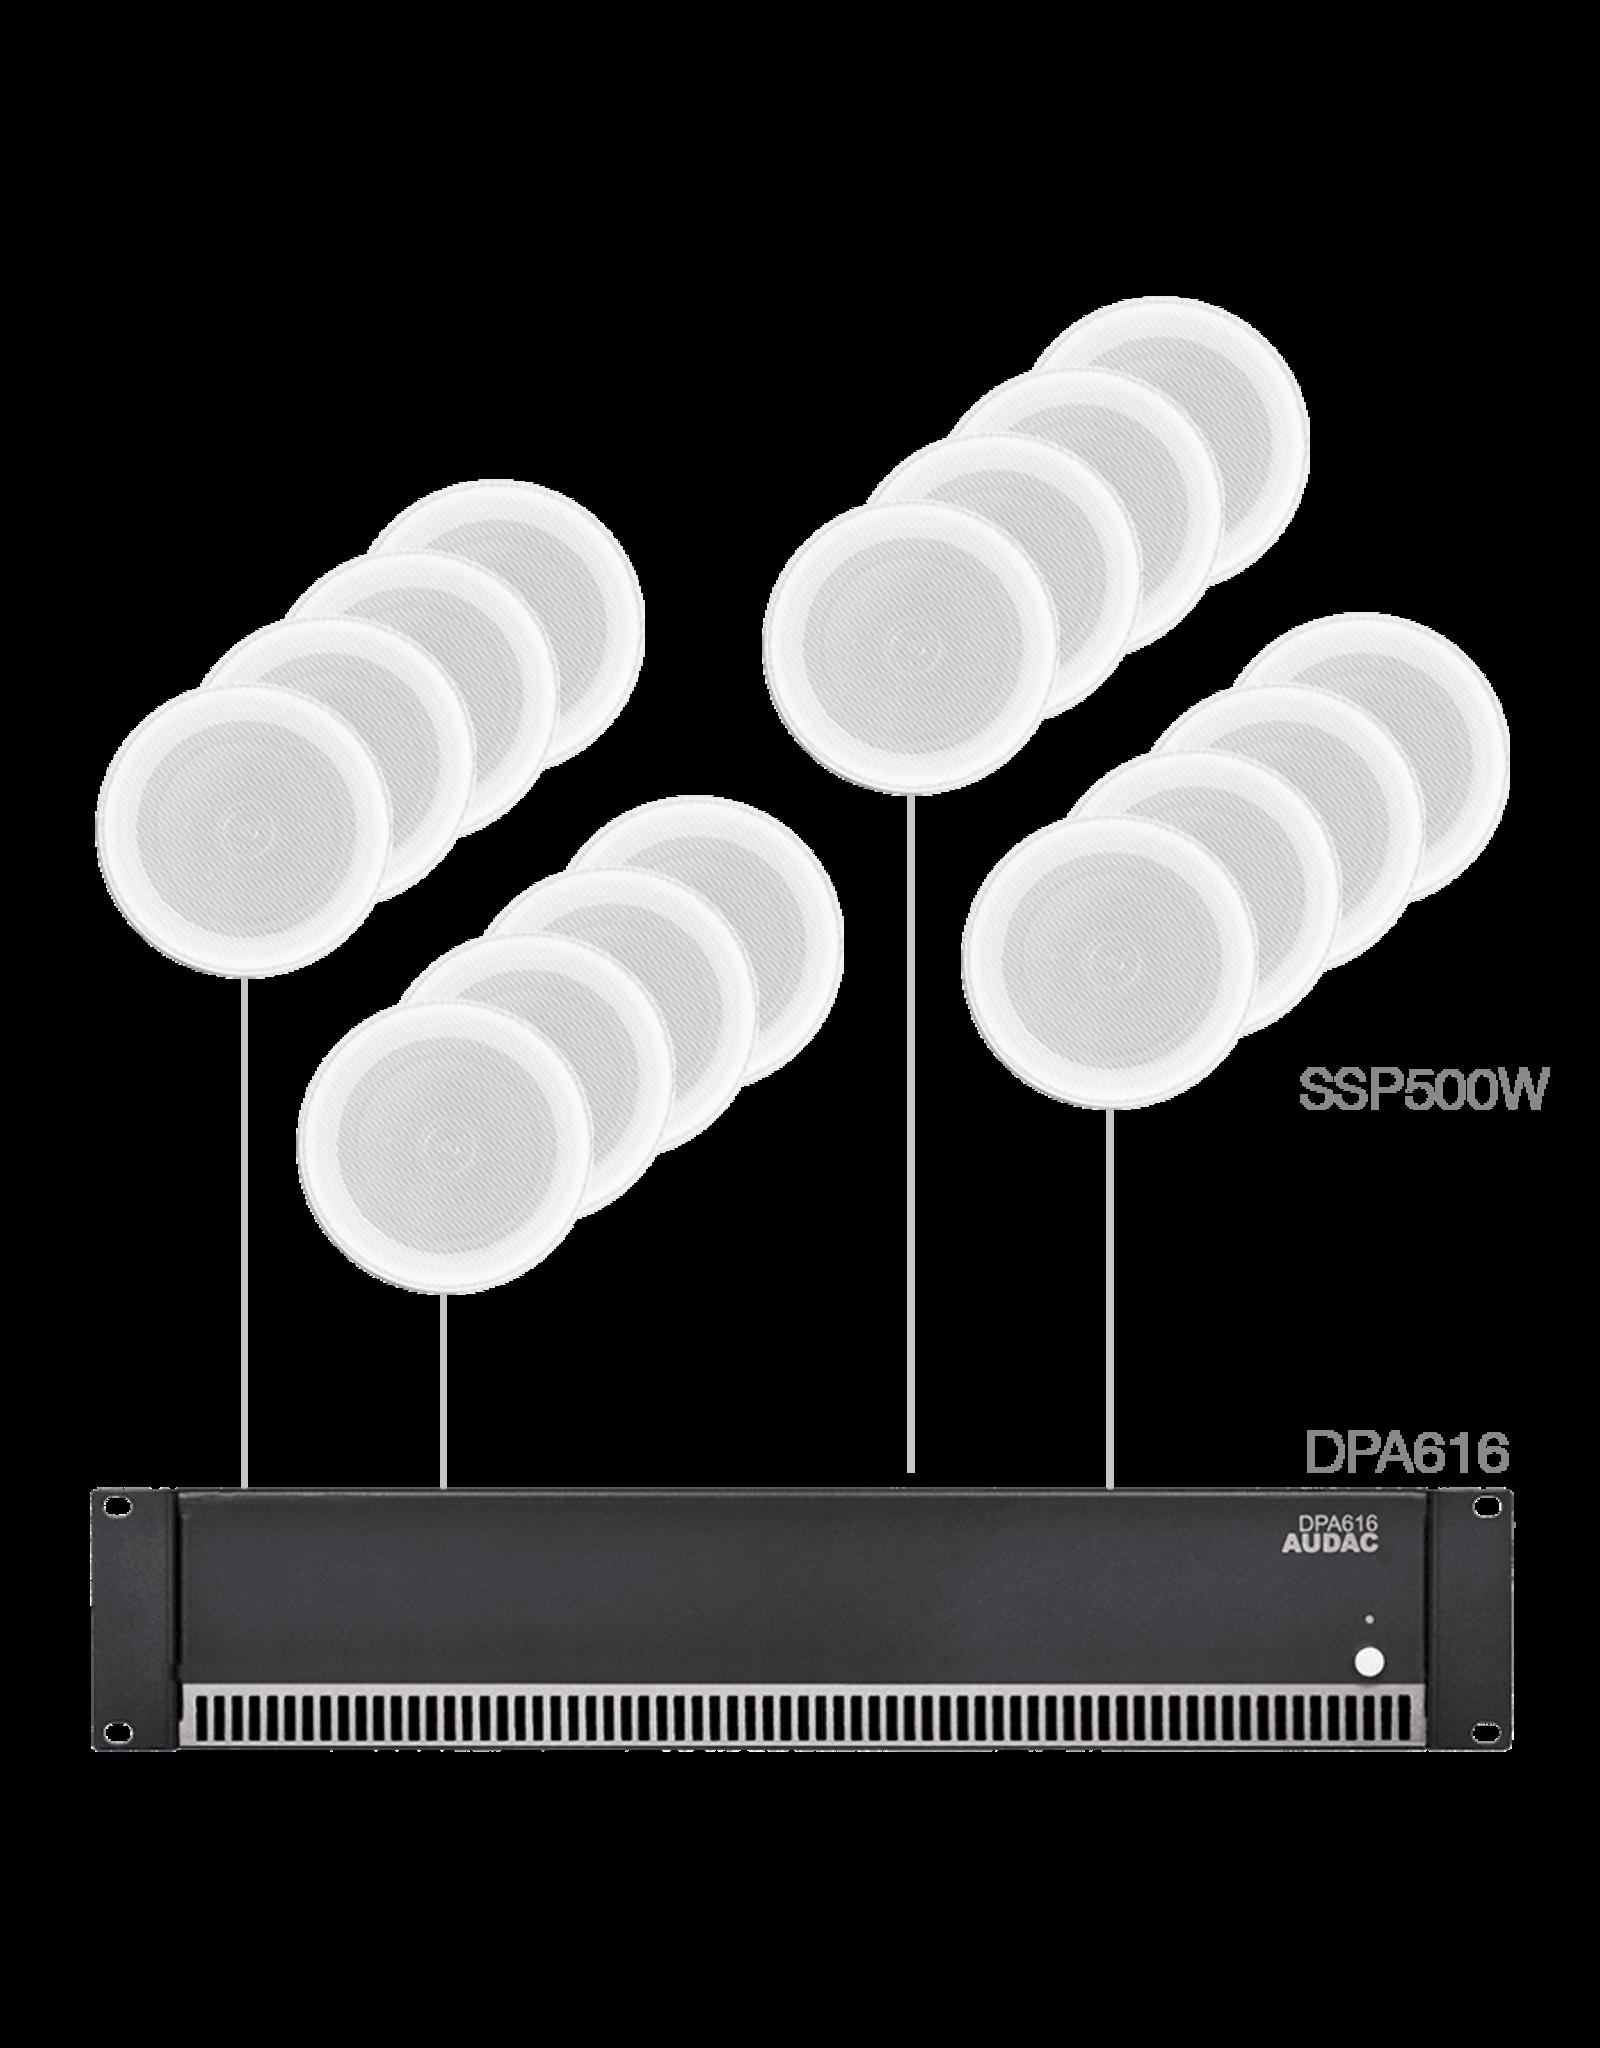 Audac 16x SSP500 + DPA616  White